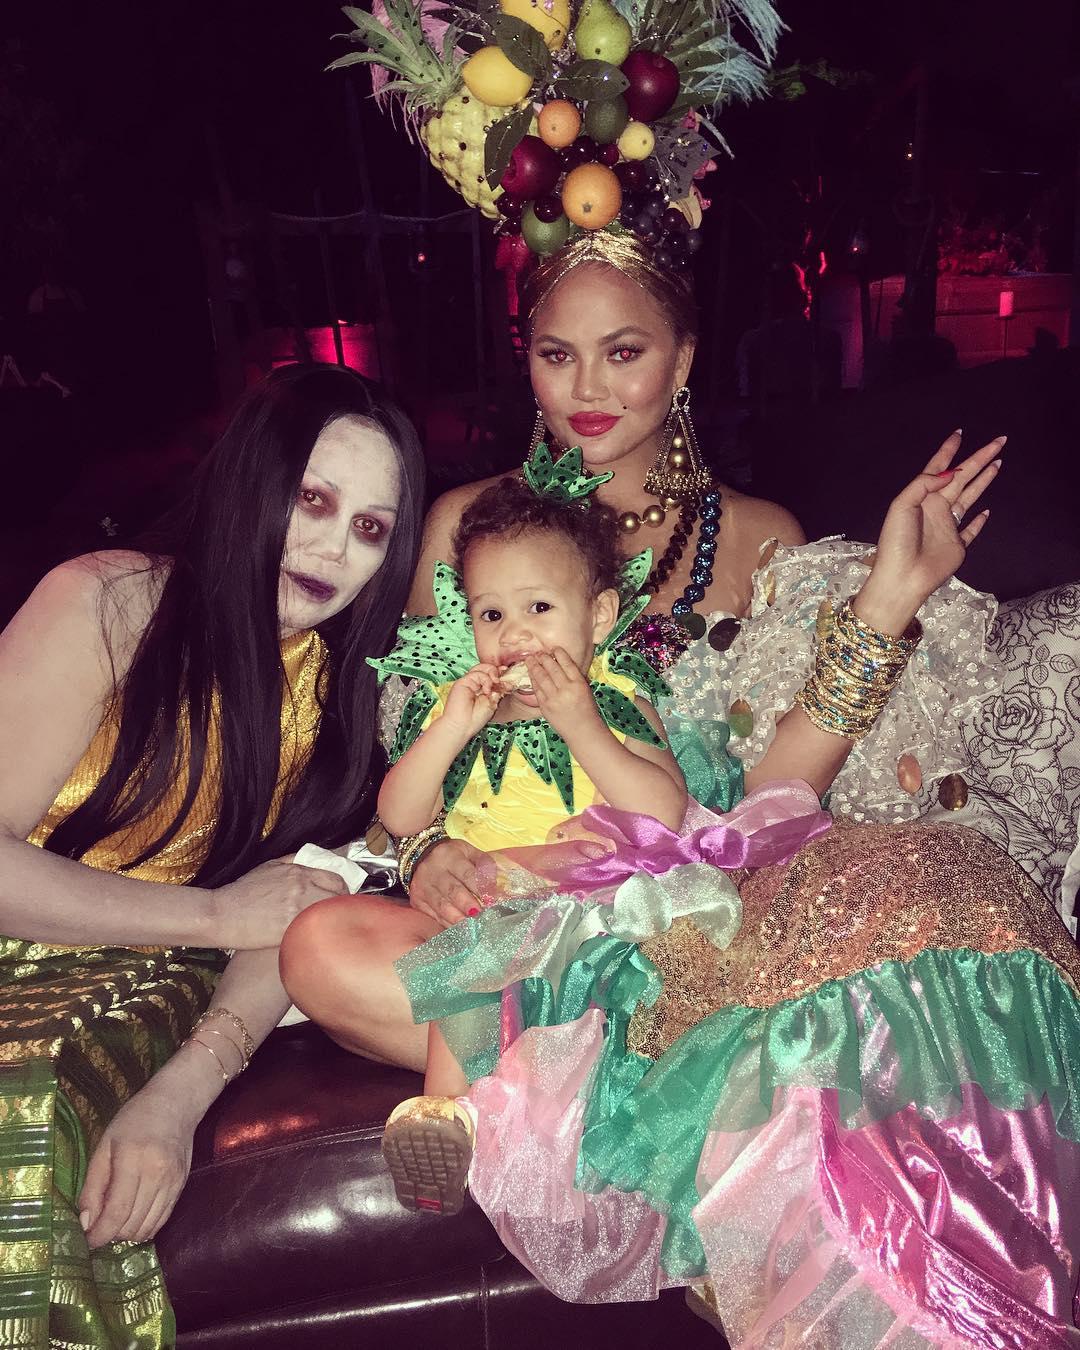 Chrissy Teigen John Legend Halloween 2017 Carmen Miranda